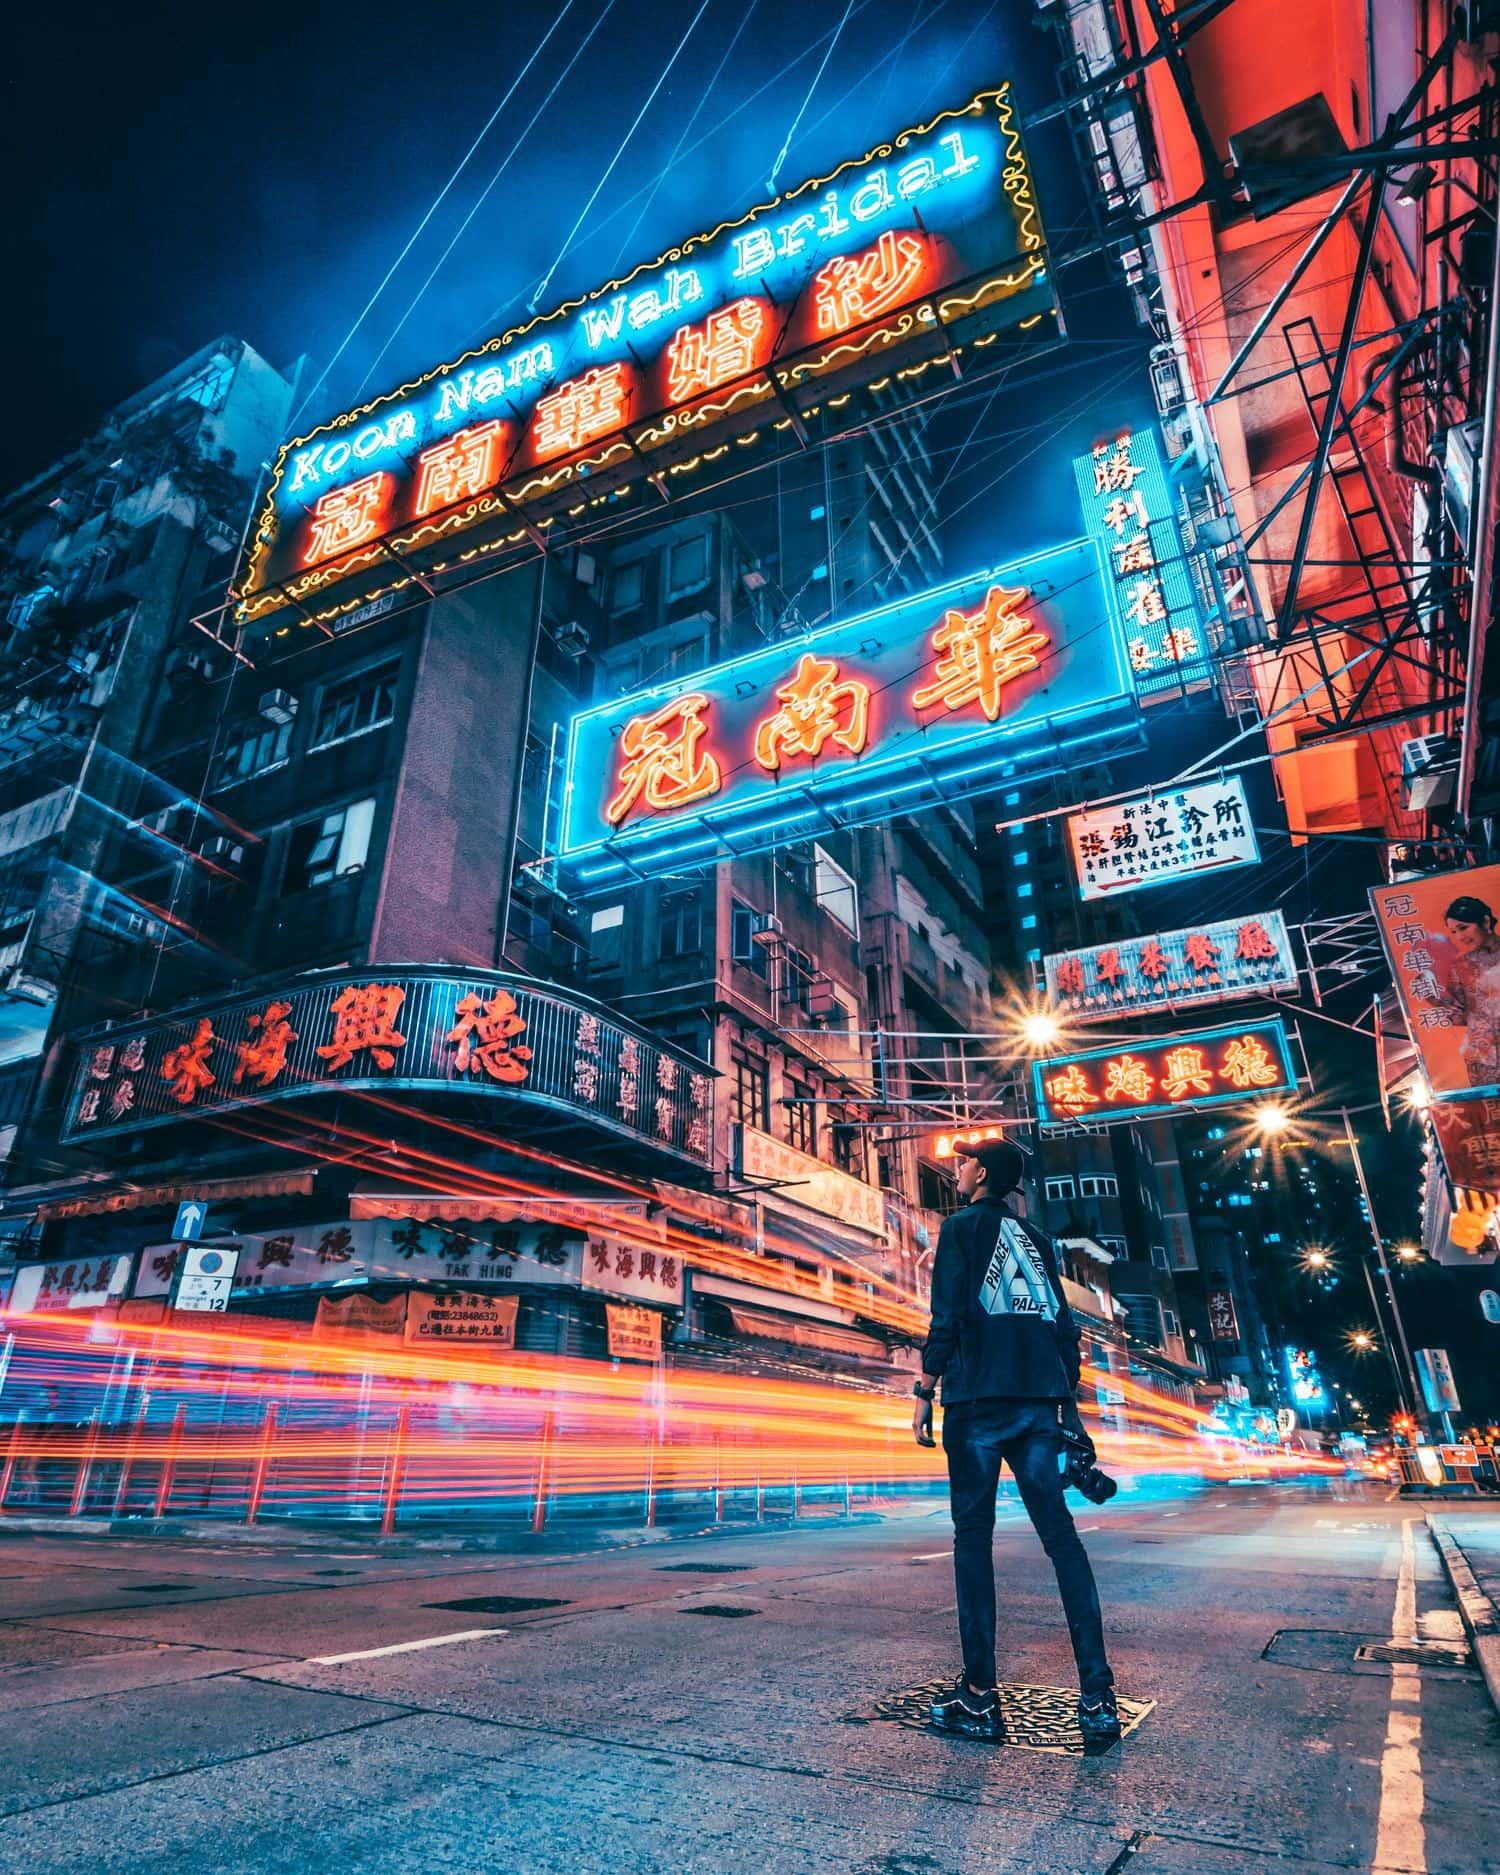 urbana de noche